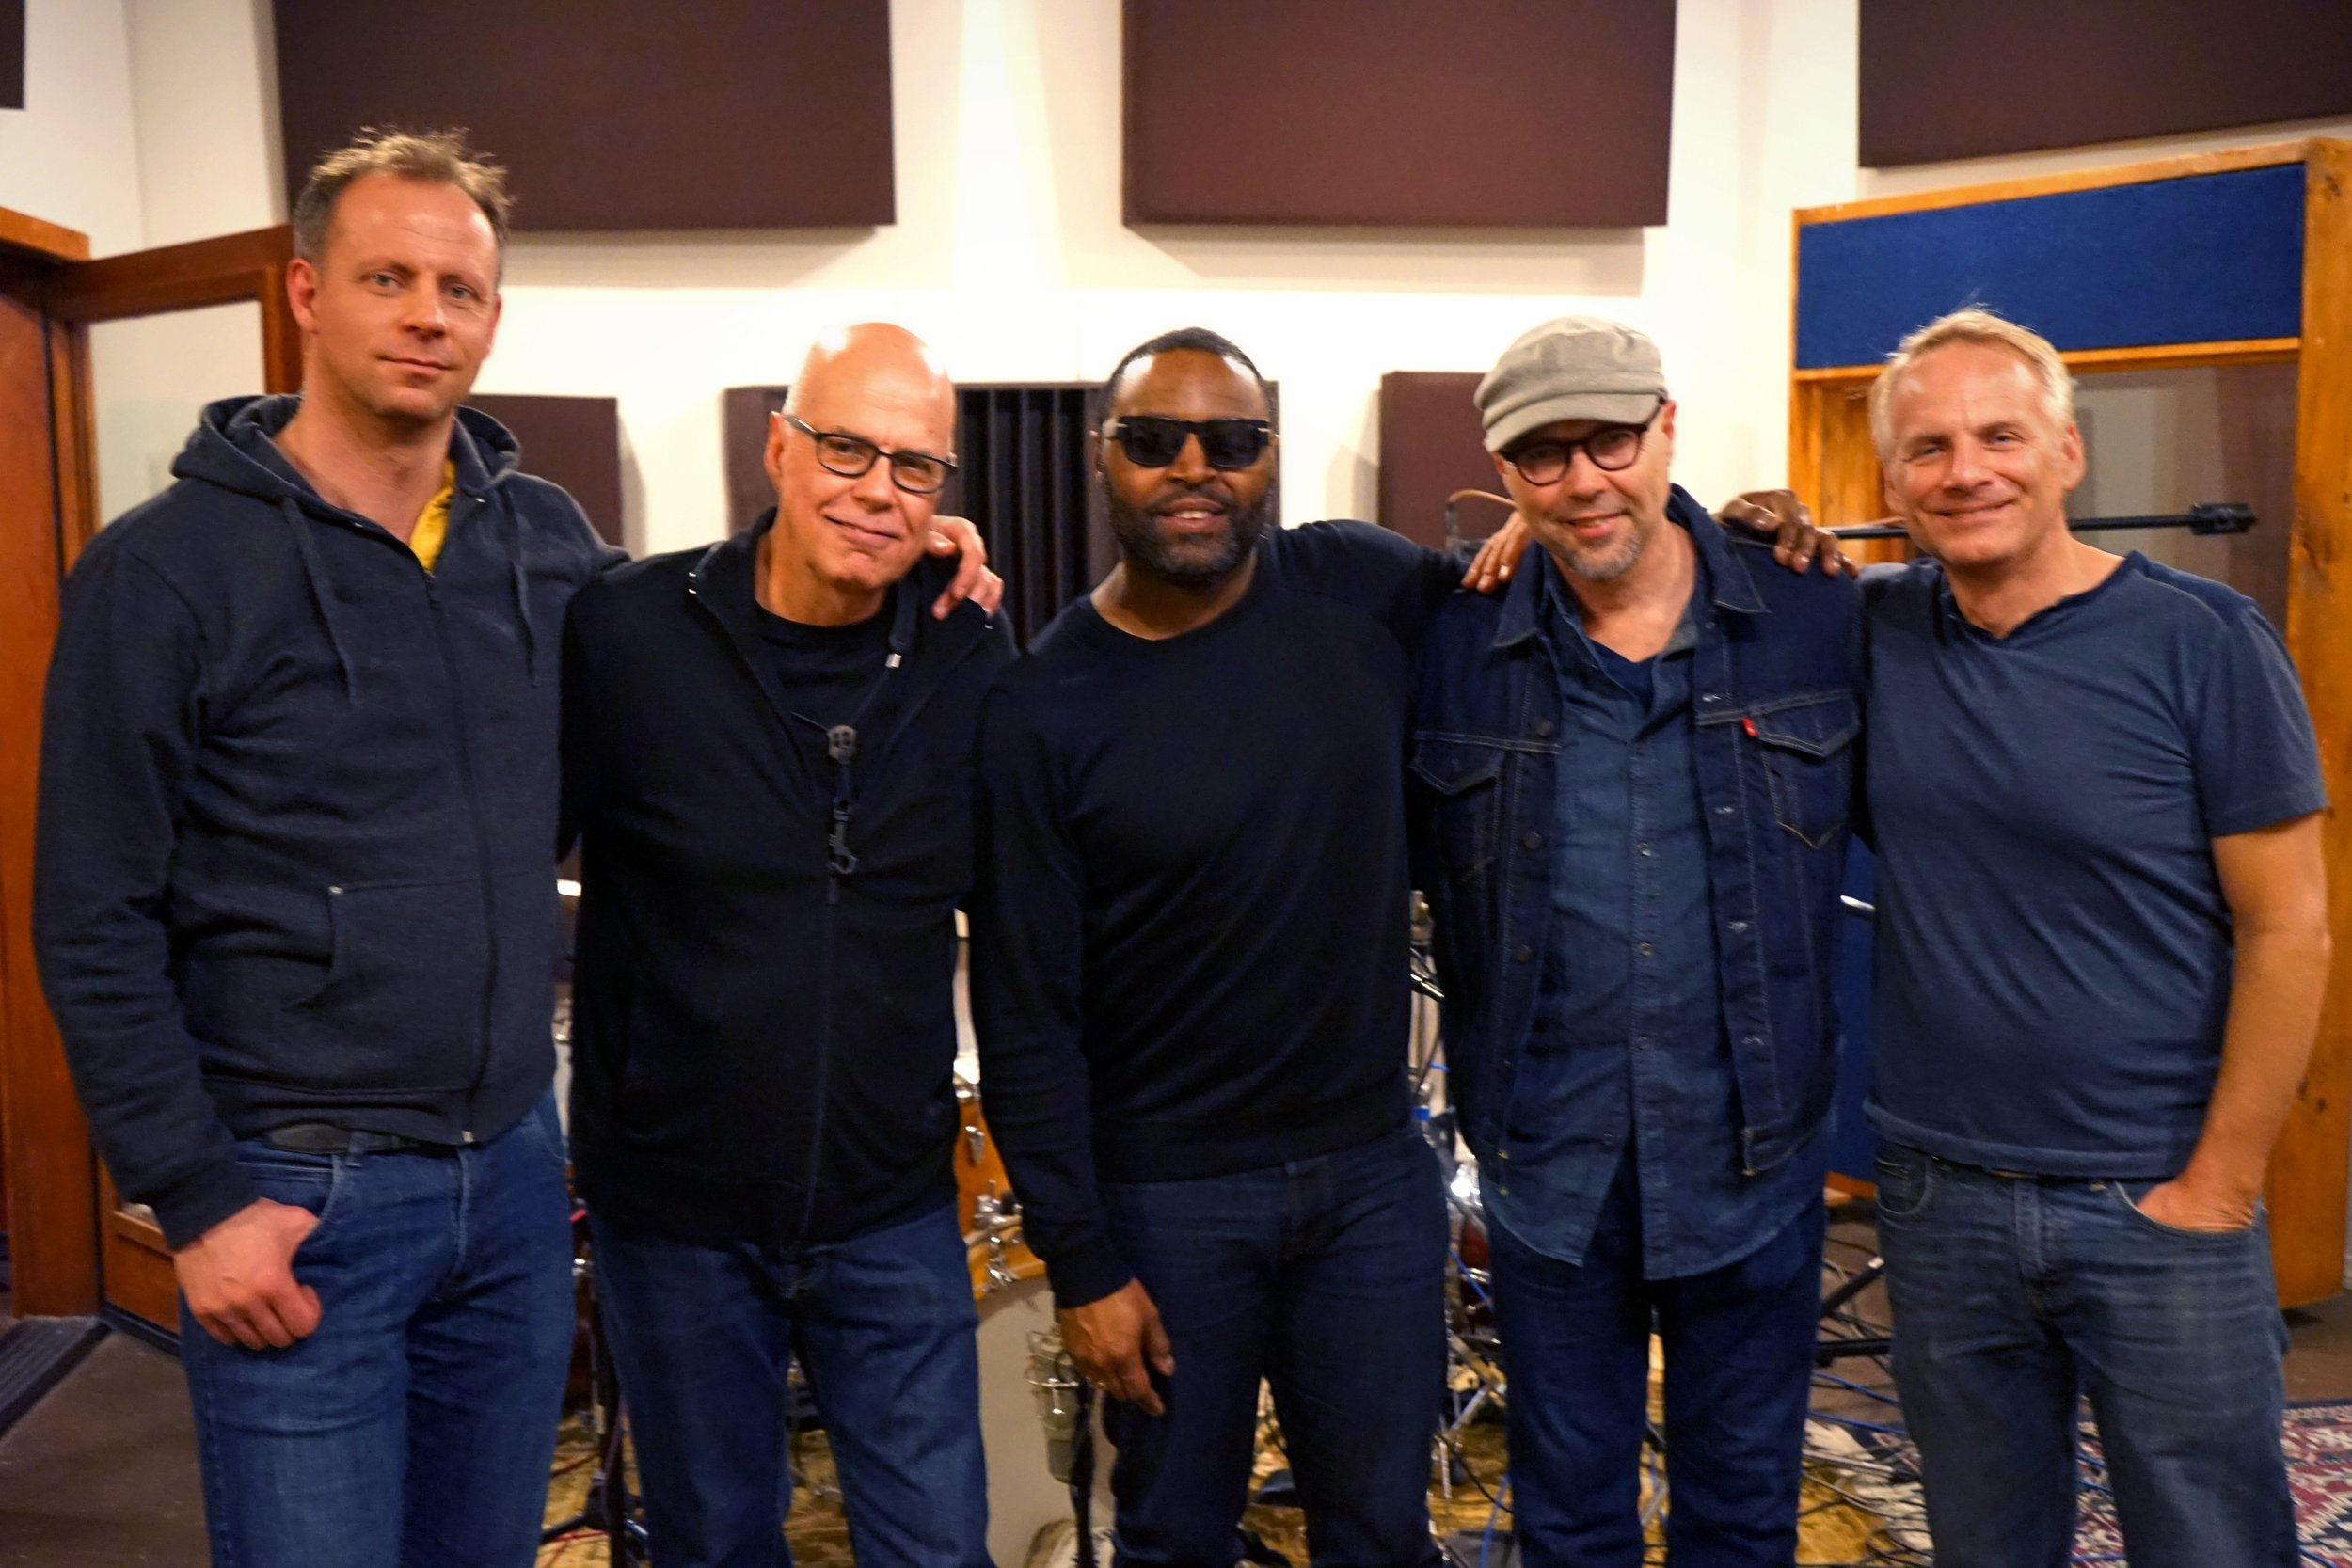 L-R: Jasper Somsen, Bob Sheppard, Kendrick Scott, John Beasley, Talley Sherwood